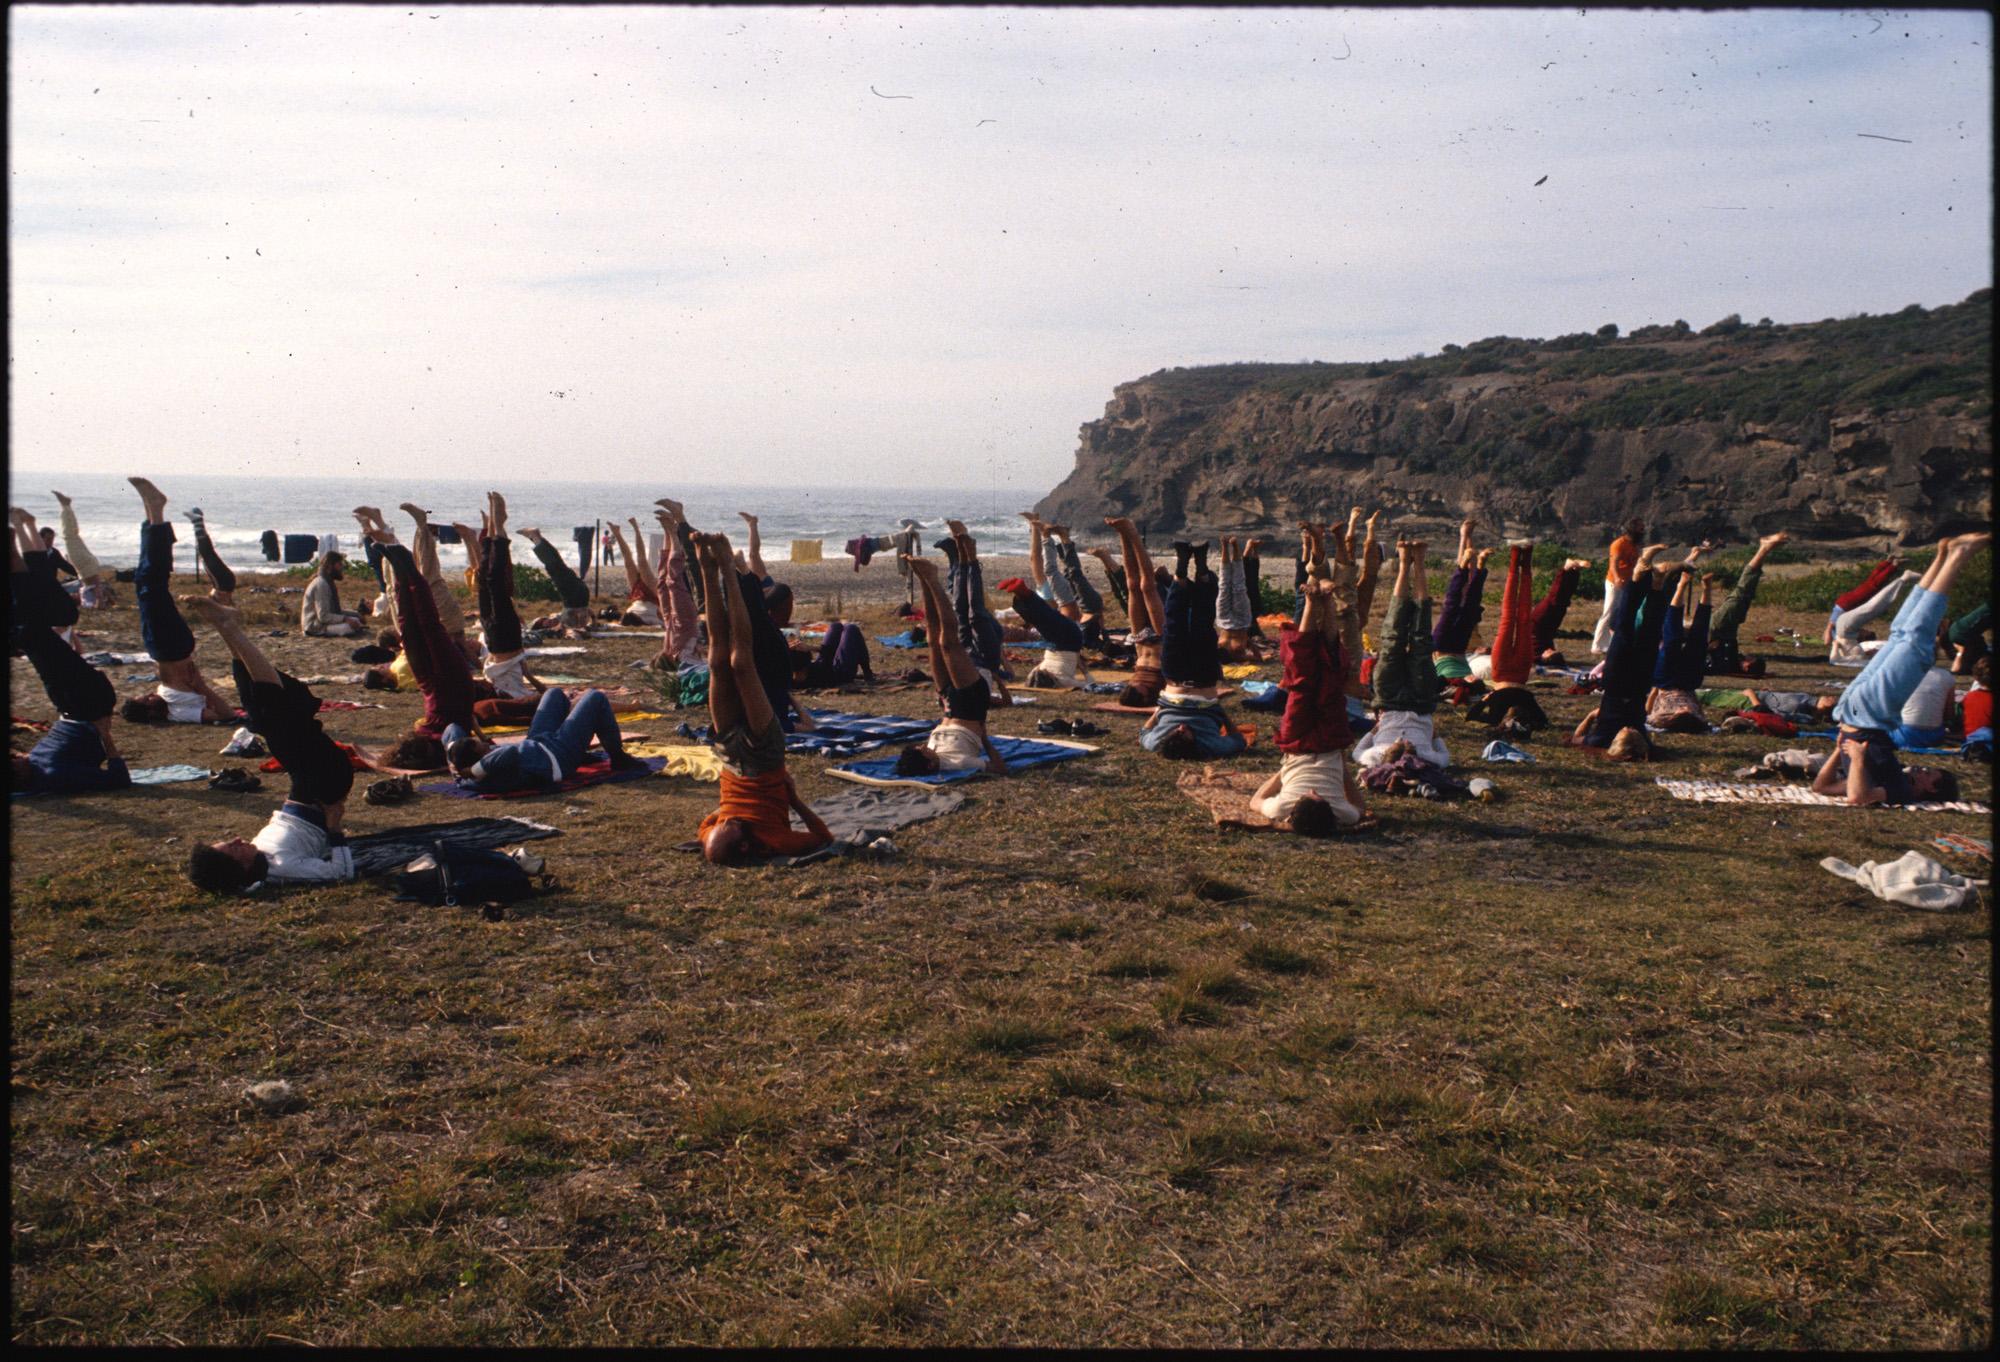 Yoga class at Ballina, Roger Marchant, c. 1975-1985